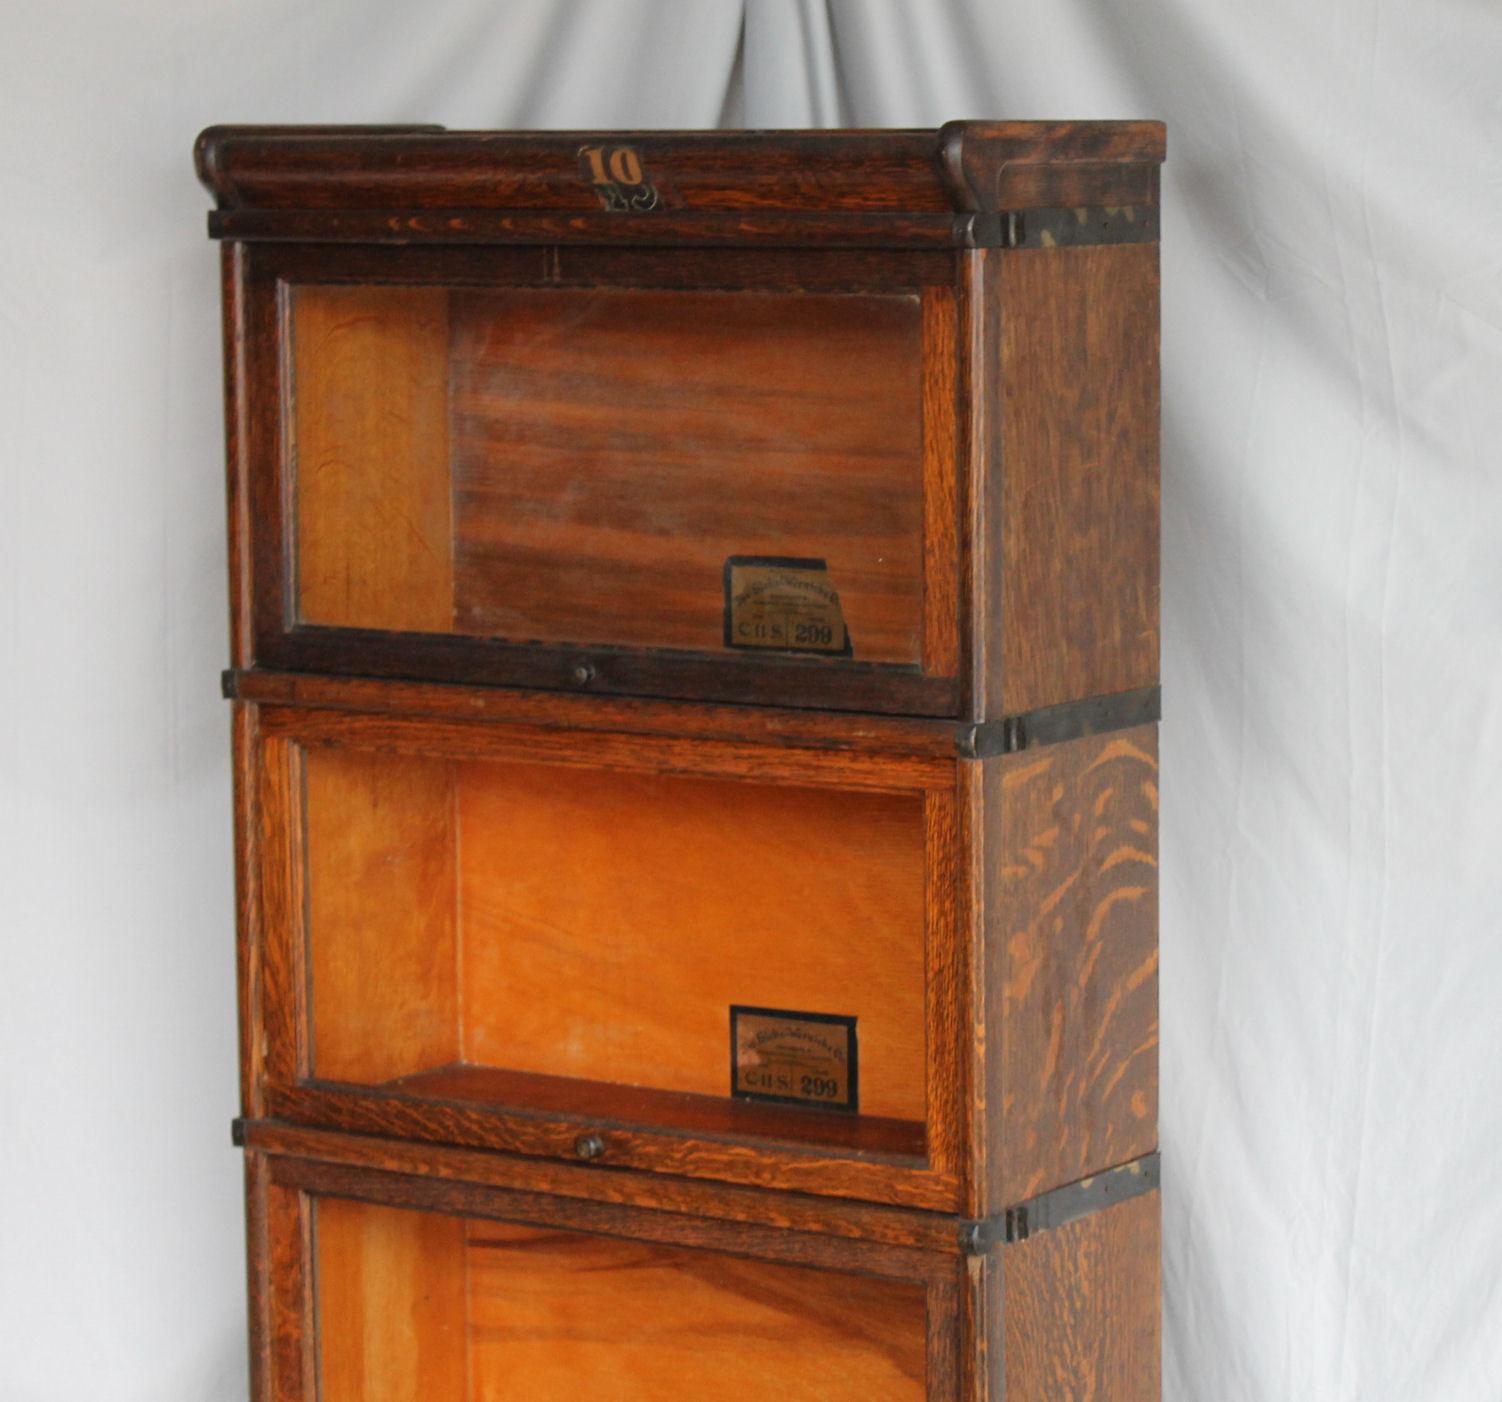 Bookcase 25 Inches Wide